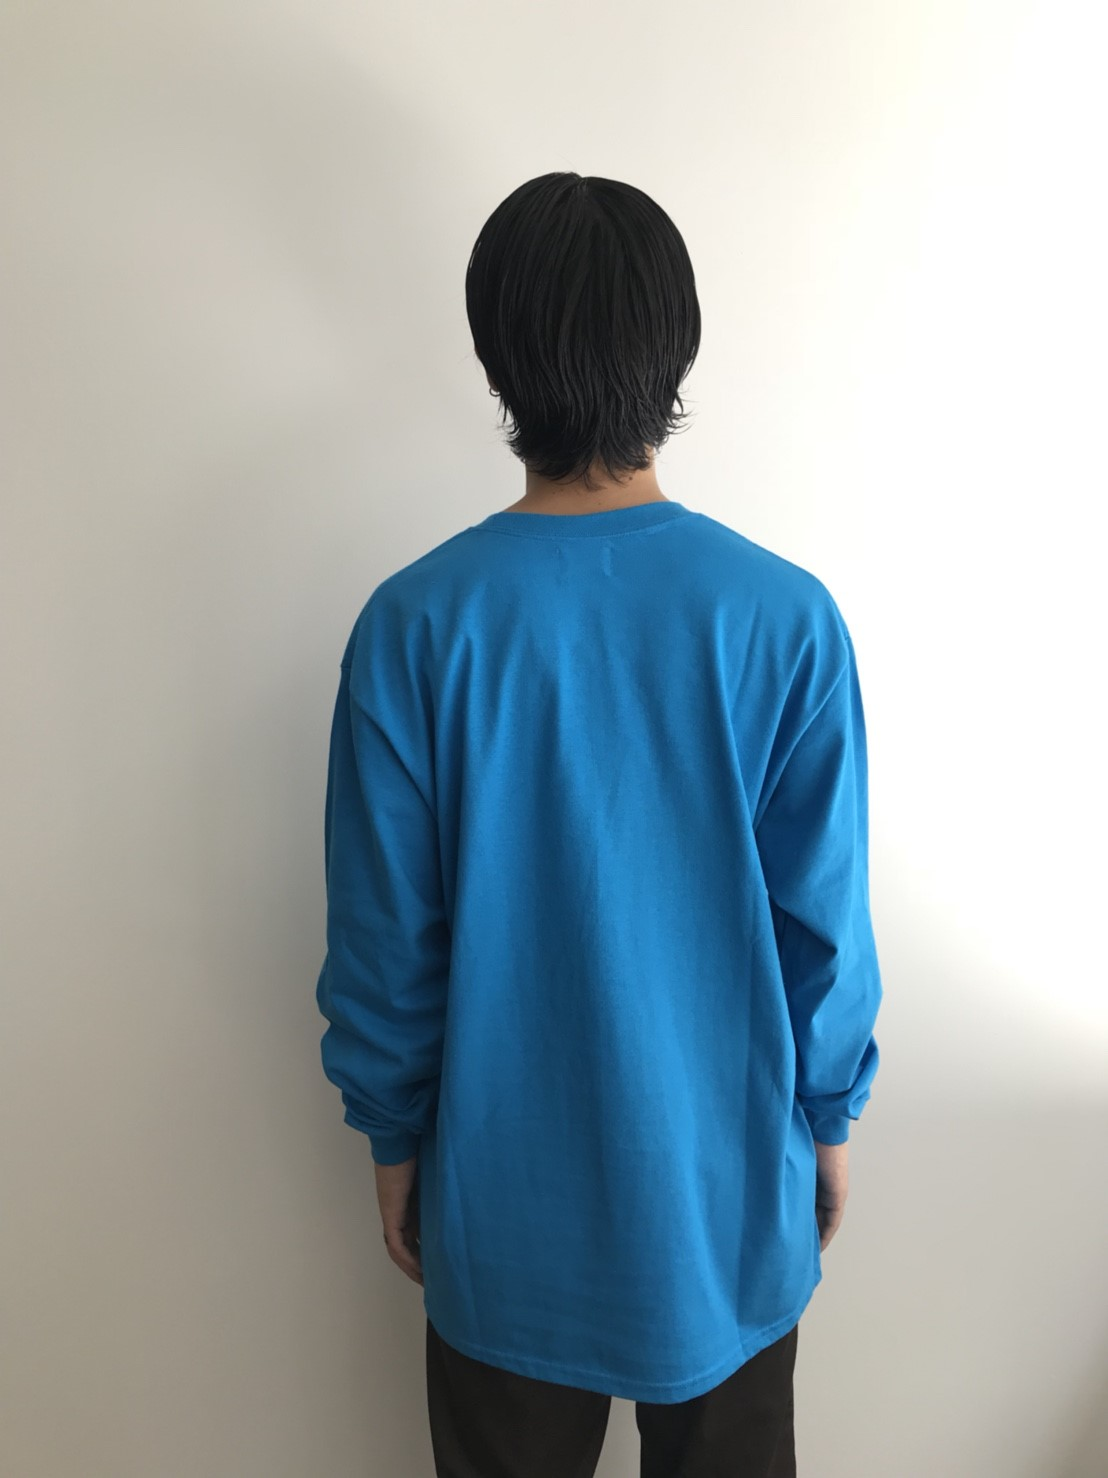 20180819_180819_0041